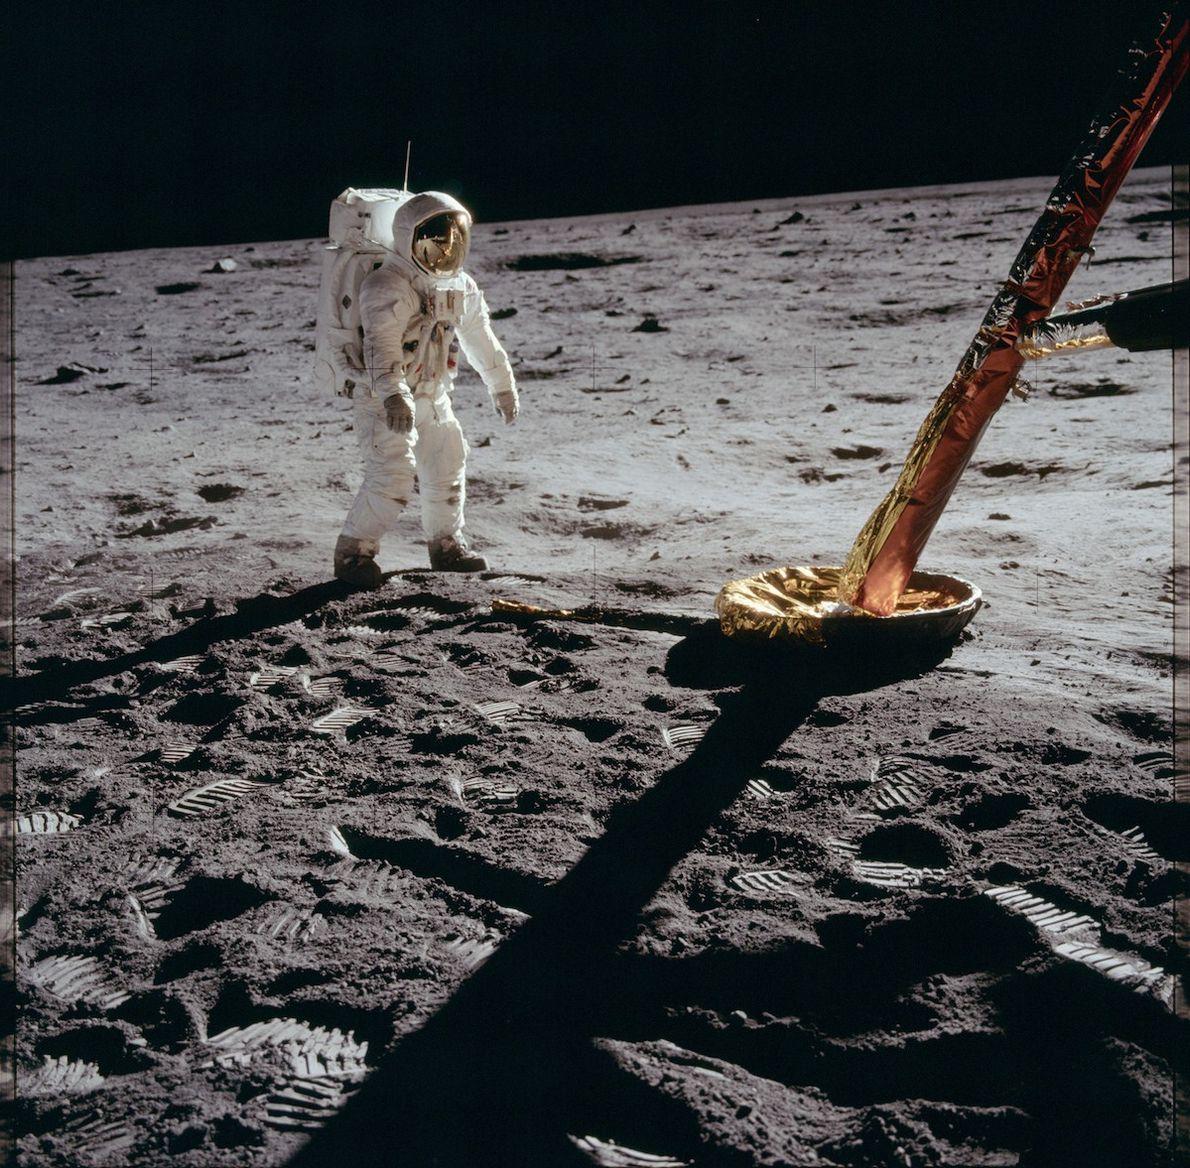 Astronaut Buzz Aldrin walks on the surface of the moon near a leg of the Eagle ...